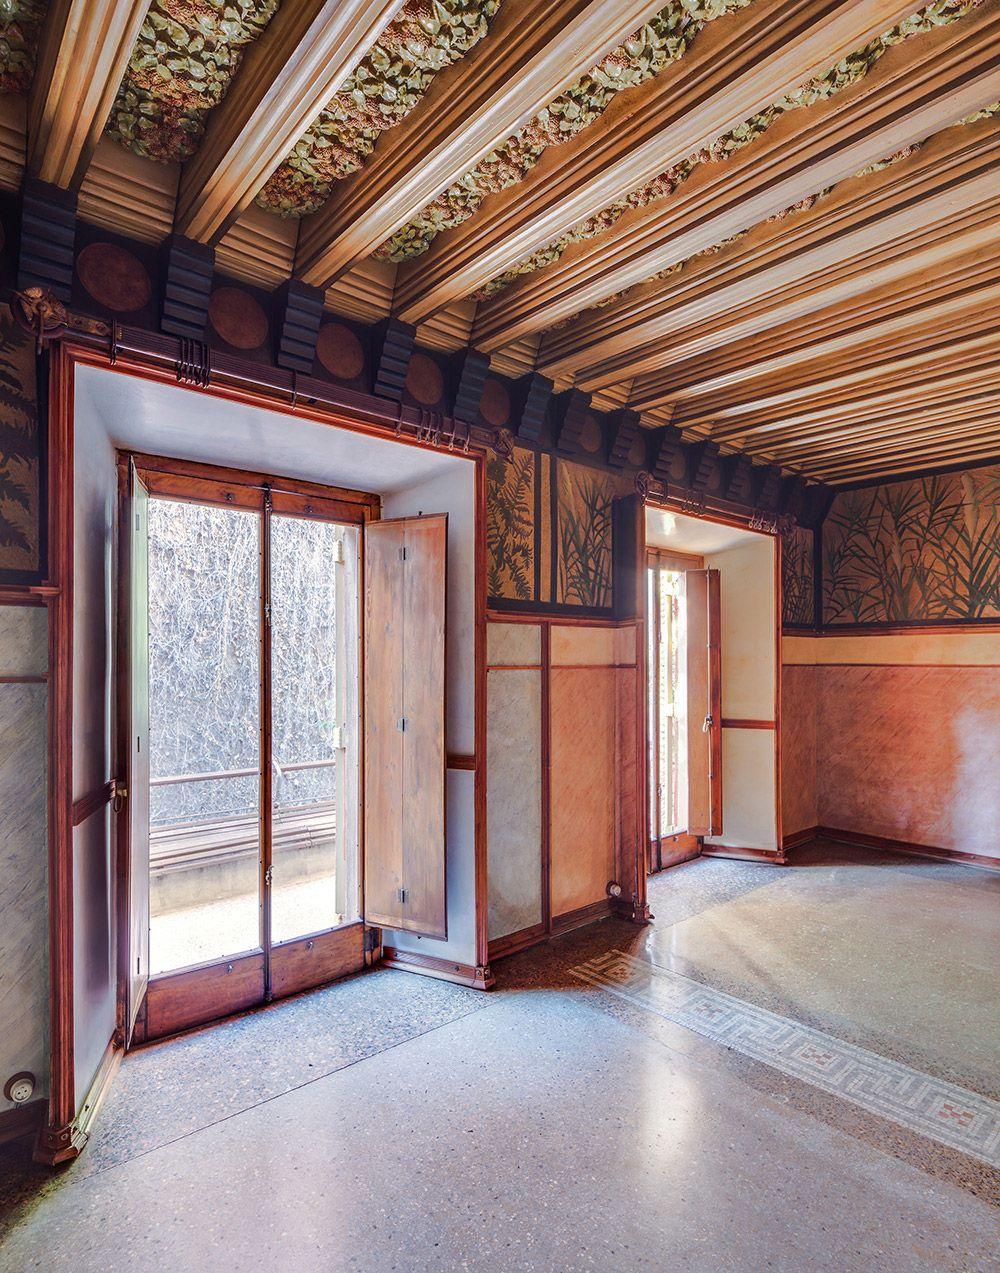 th century residence designed by architect antoni gaudi will soon be open to the public booooooom create inspire community art design music also rh pinterest